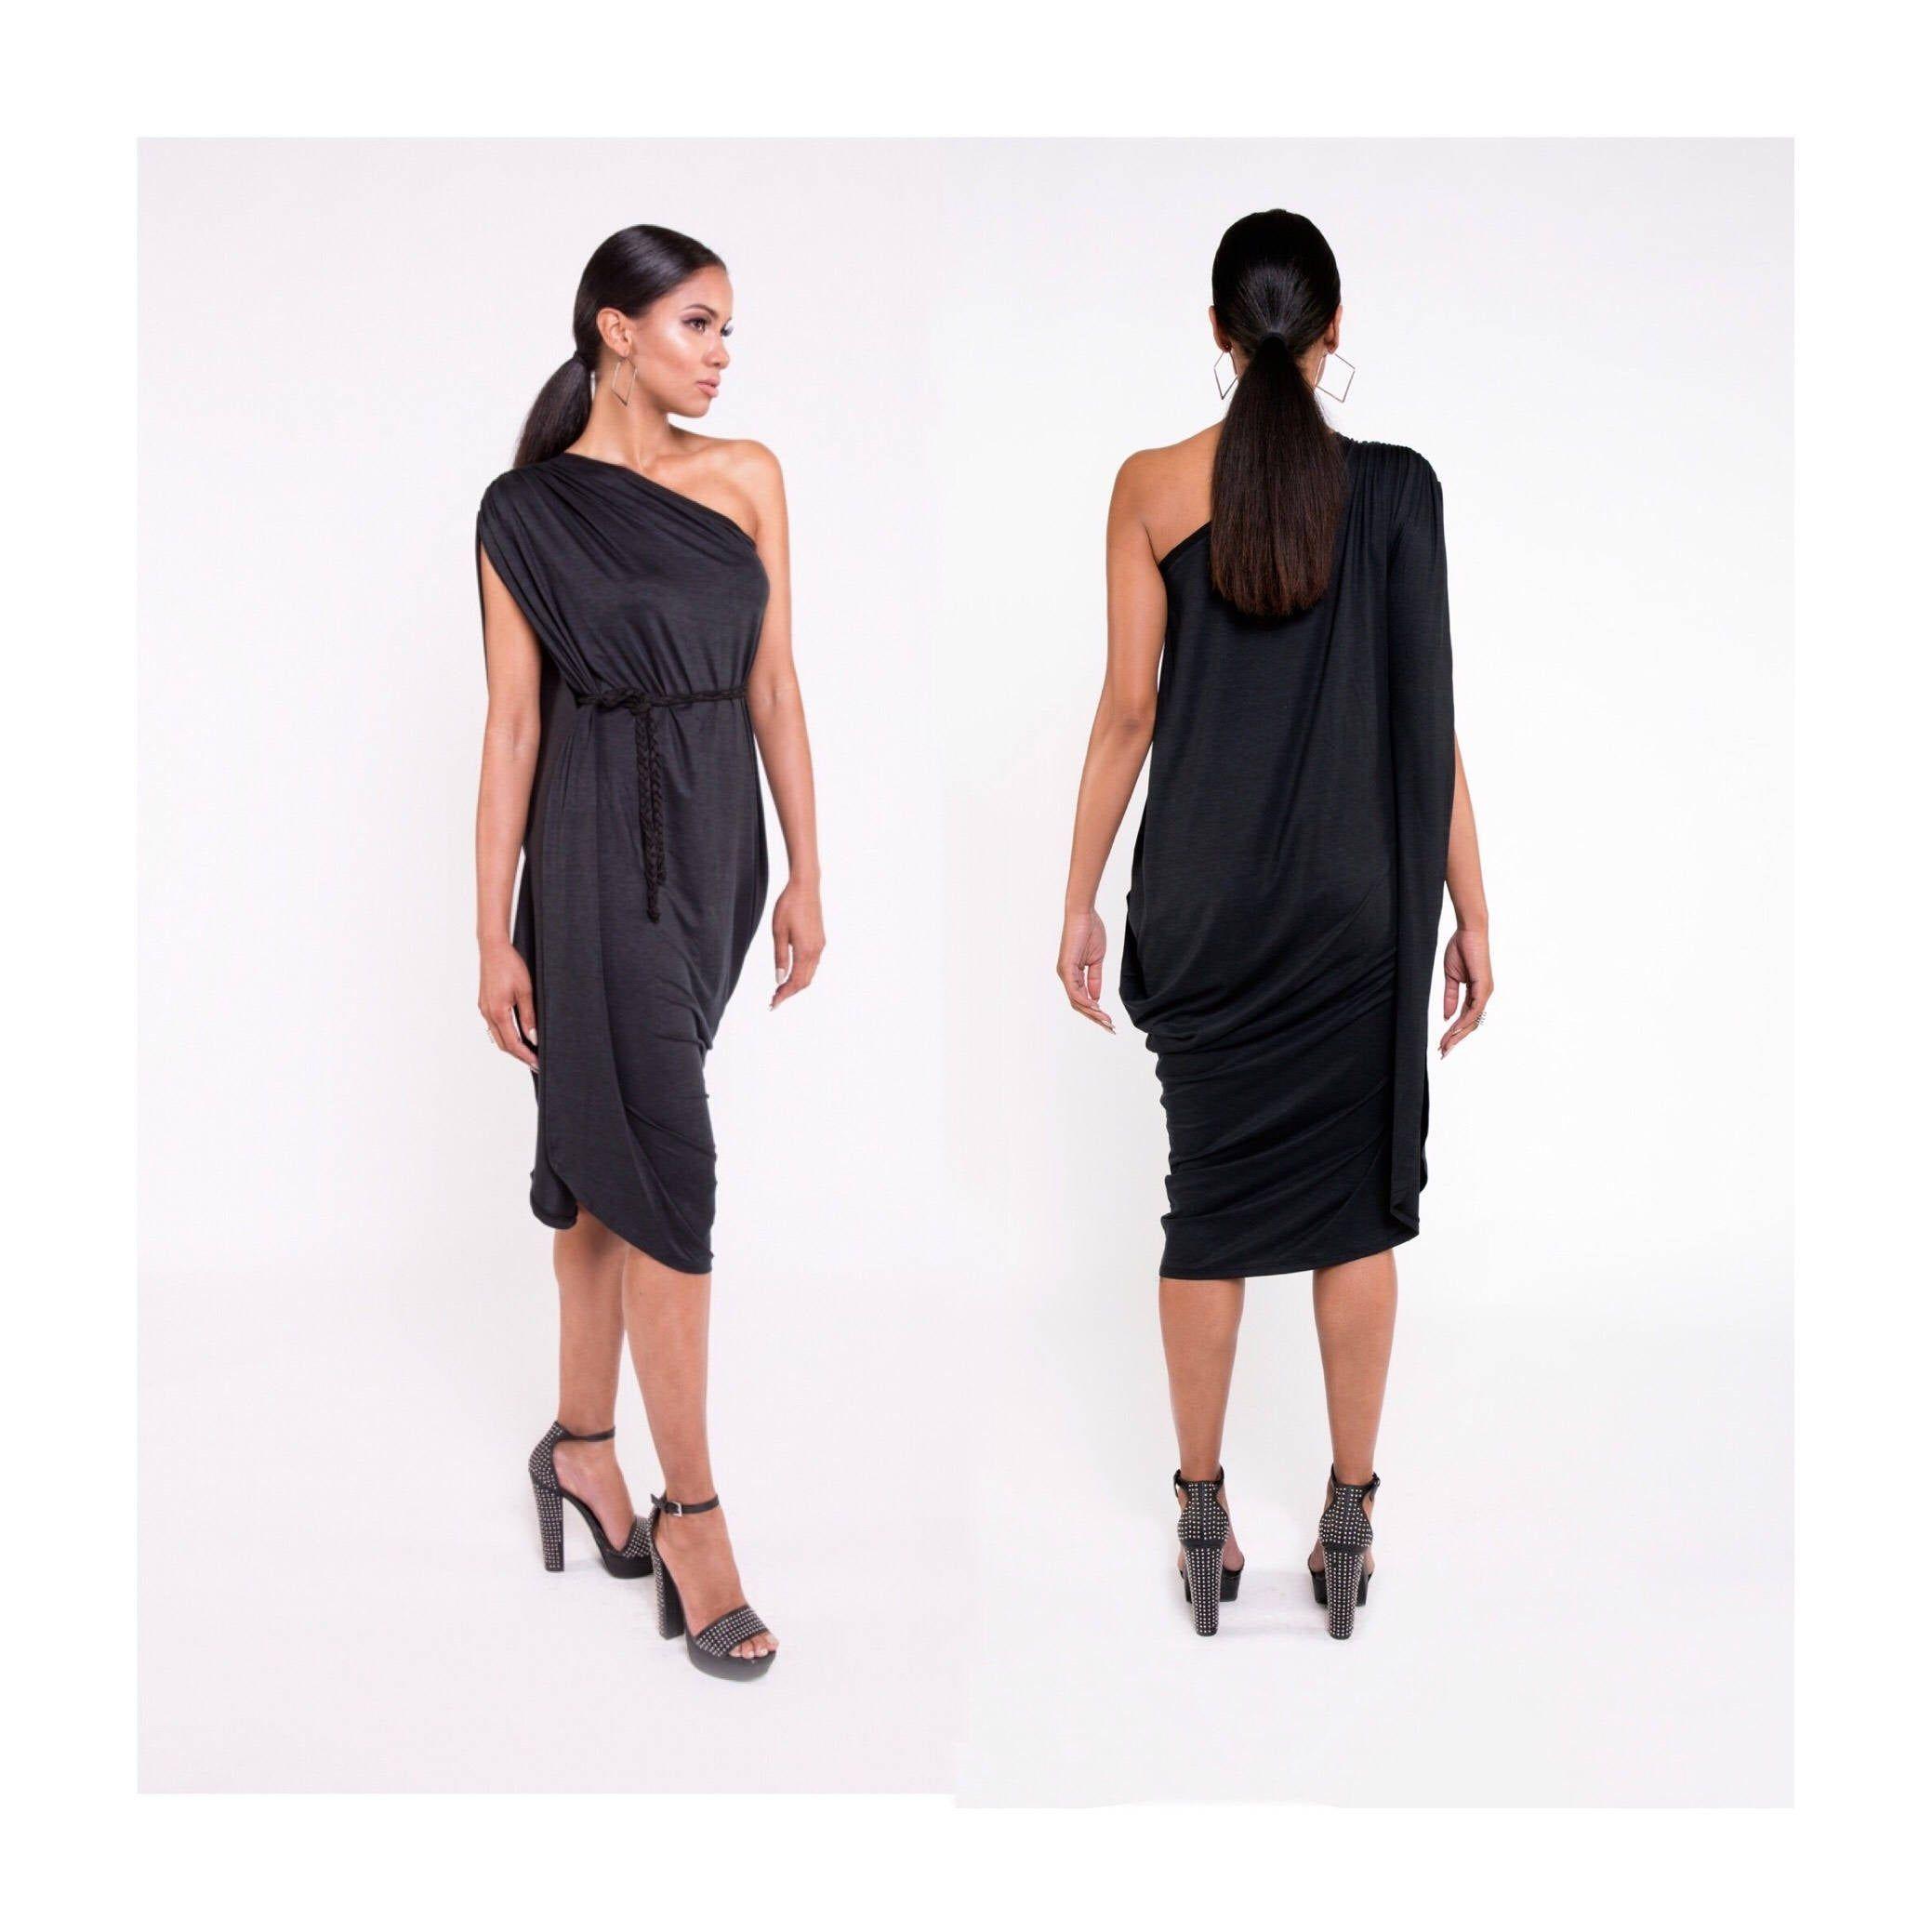 Elegant Black Dress Black Dress Black Drape Dress Long Etsy Elegant Black Dress Draped Dress Long Dress [ 2078 x 2078 Pixel ]